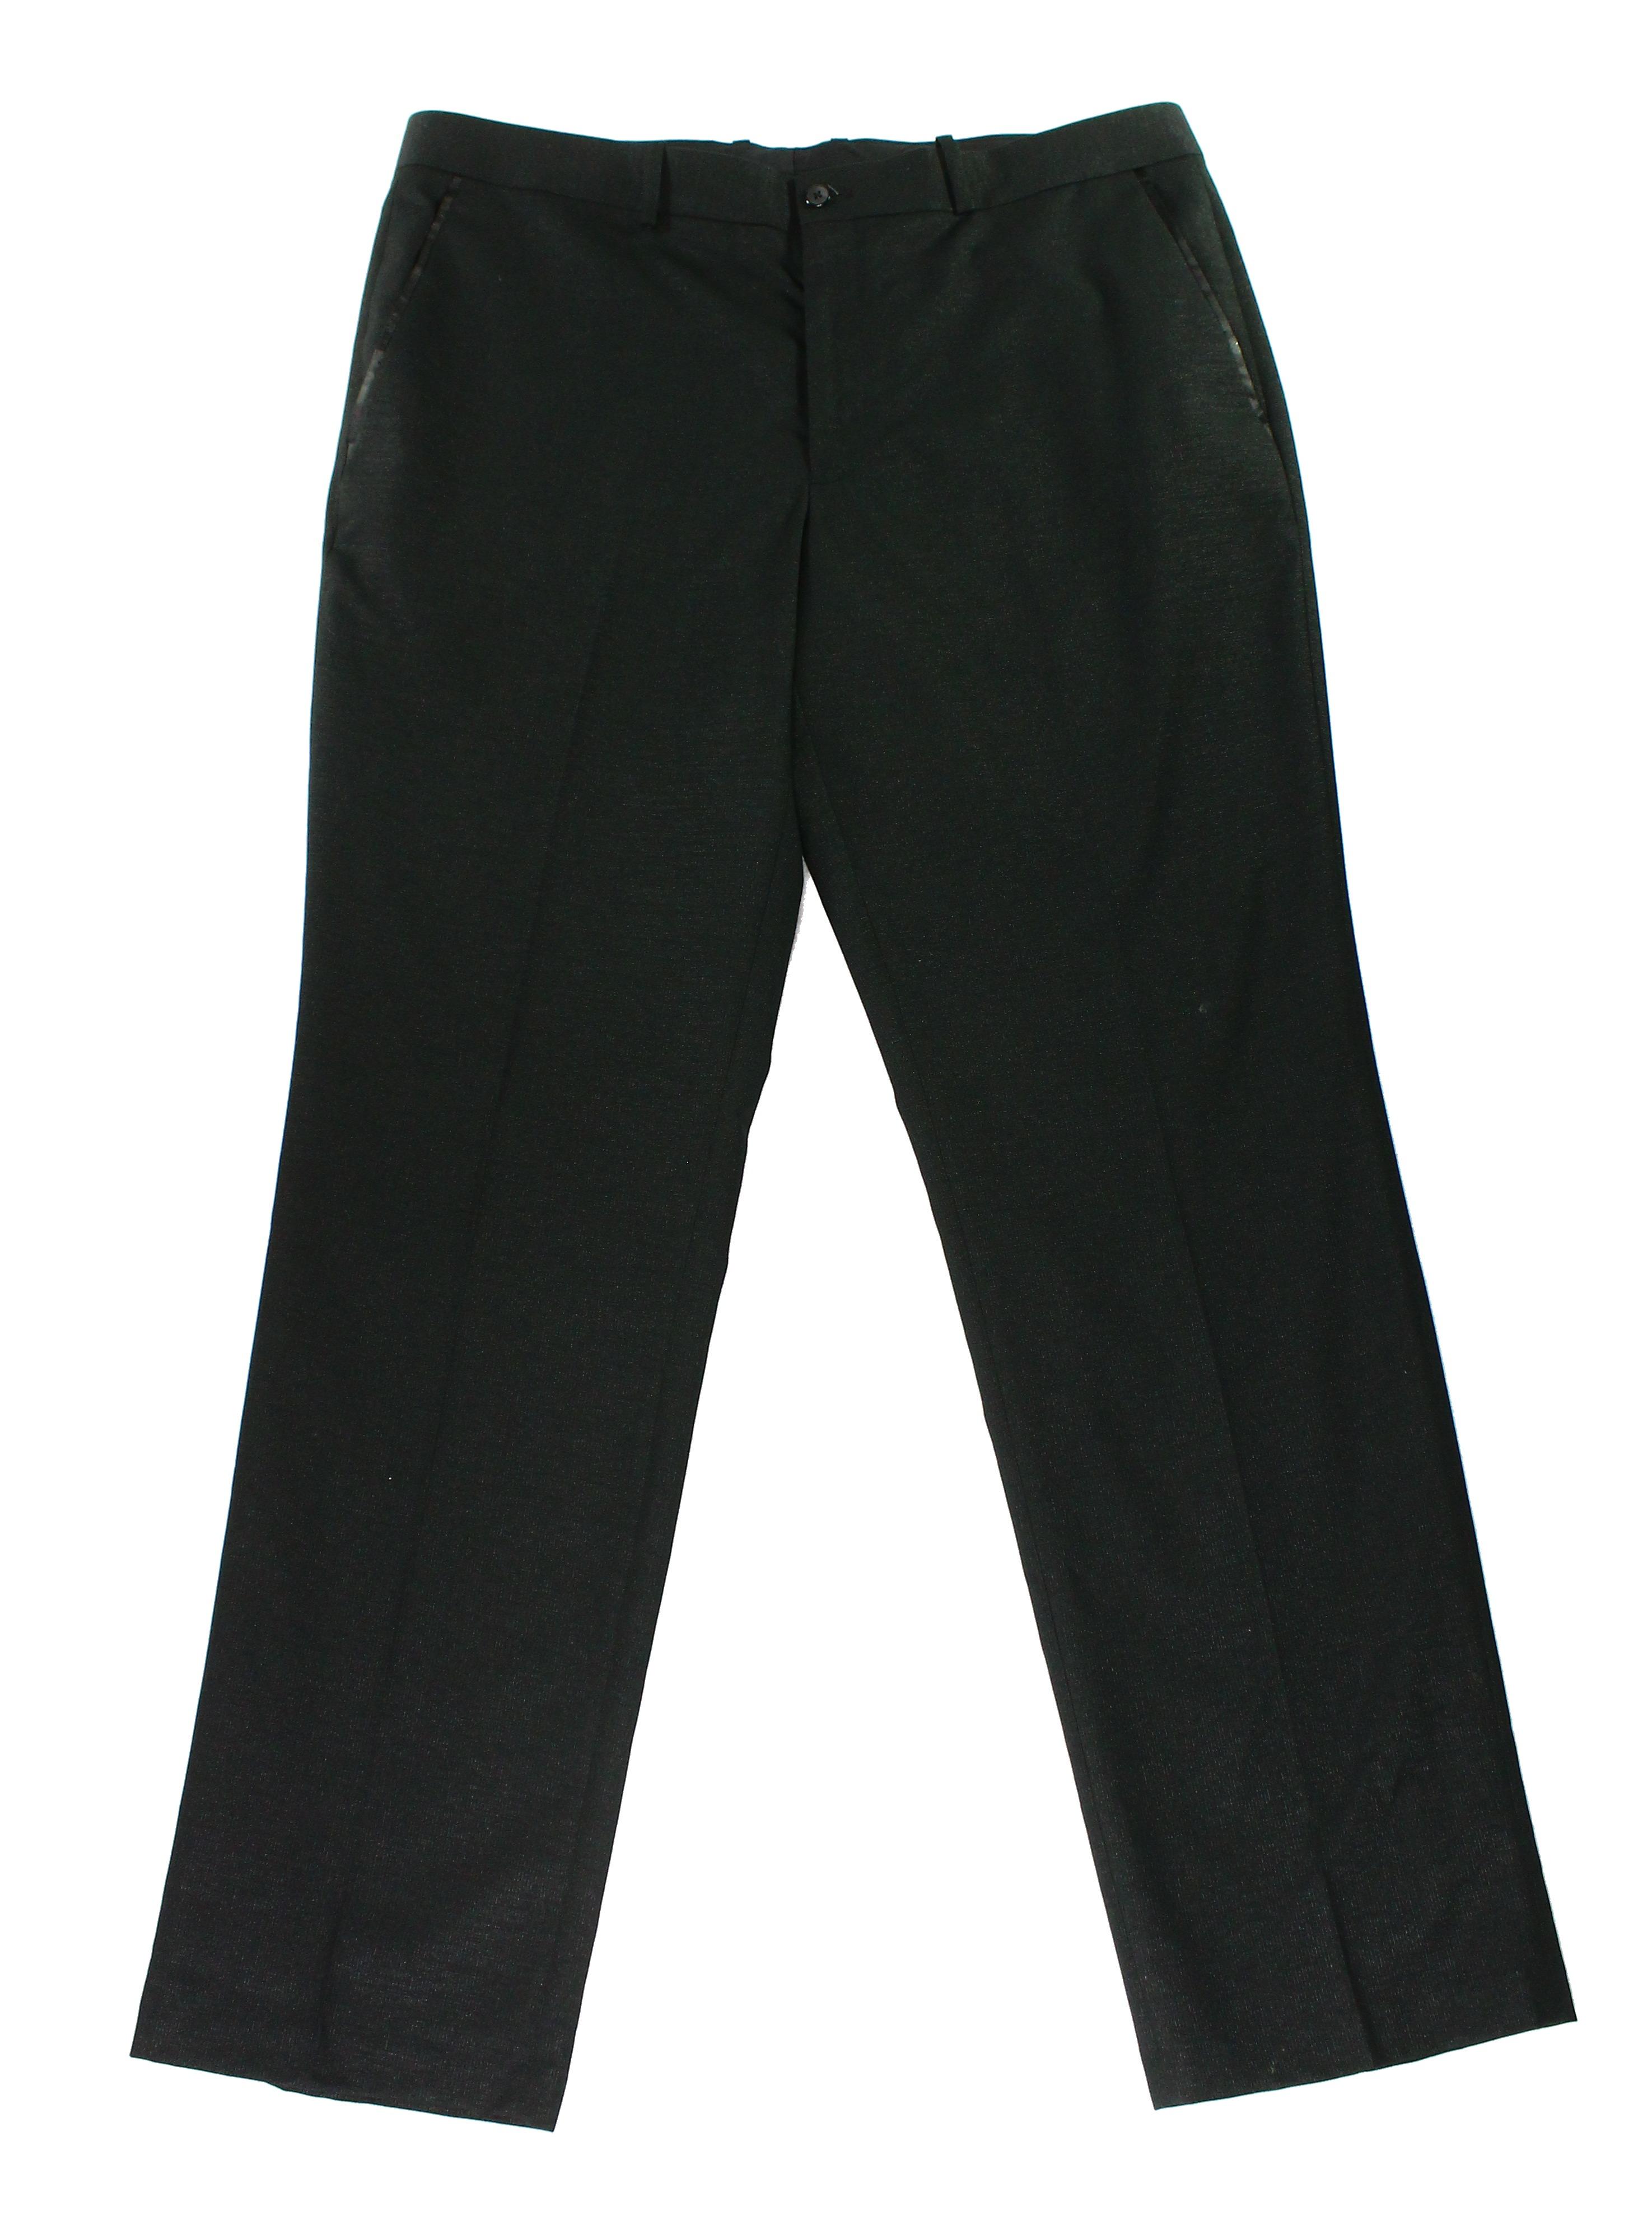 Alfani NEW Deep Black Mens Size 34x34 Flat Front Slim-Fit Dress Pants